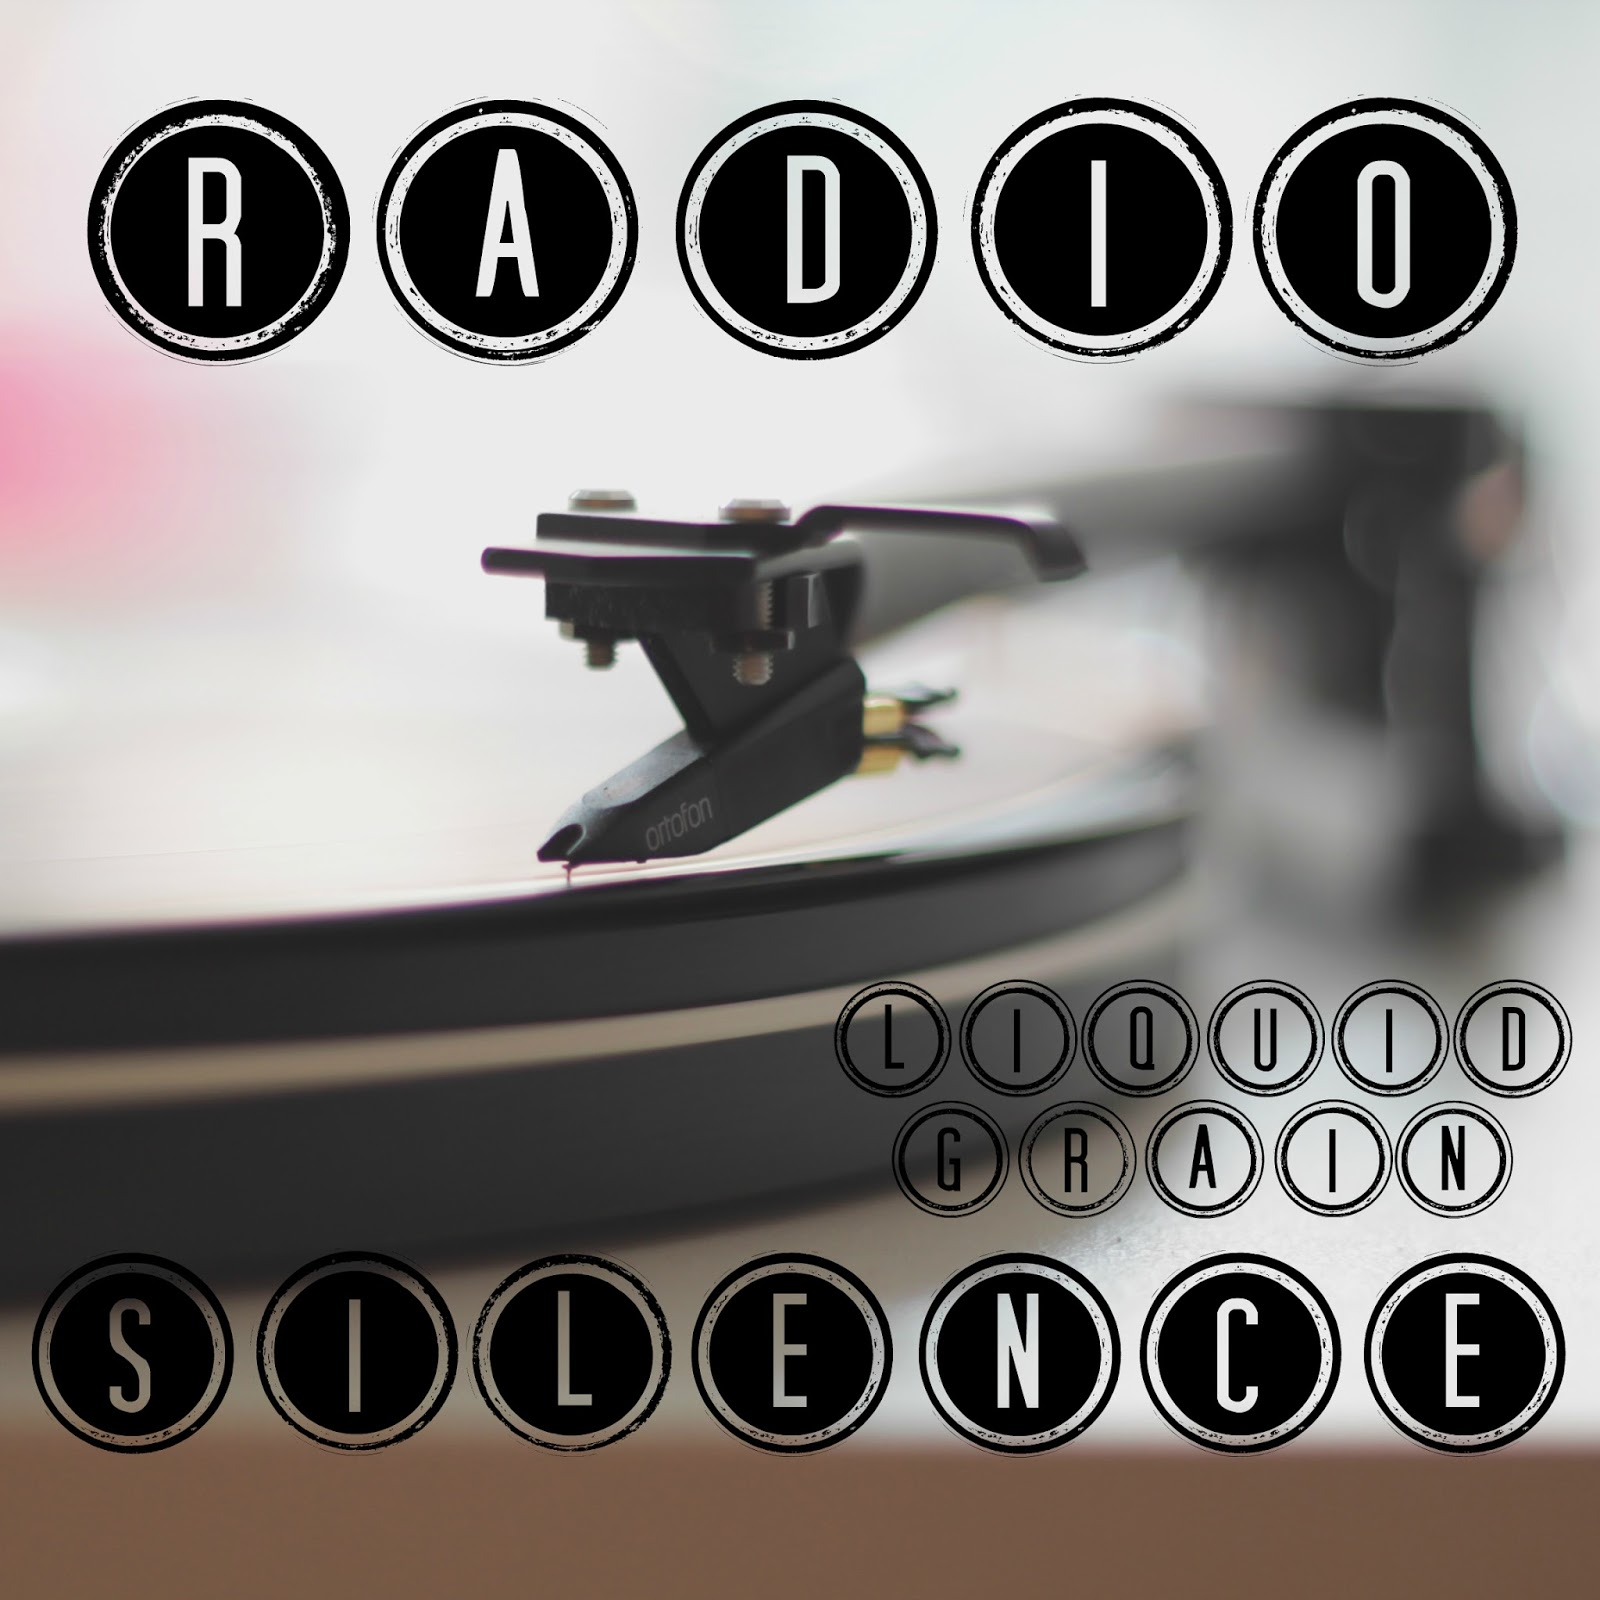 radio silence liquid grain liquidgrain vlogtober